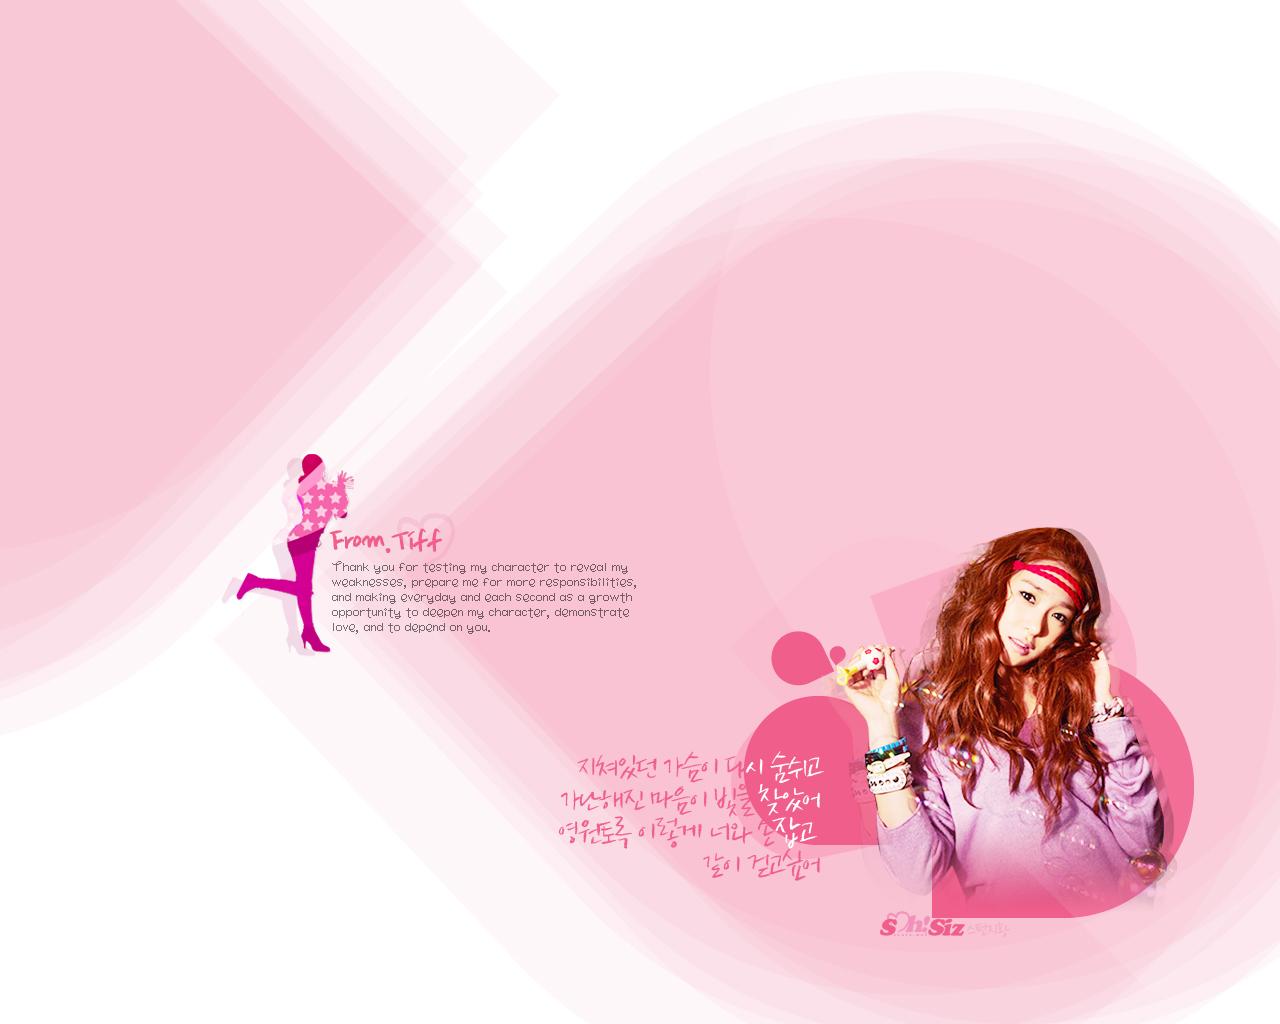 http://4.bp.blogspot.com/-OzhCOXiAEu0/UH048evF1-I/AAAAAAAAI-0/6GH2rWbUlgw/s1600/Tiffany%2BSNSD%2BSporty%2BStyle%2BWallpaper.jpg